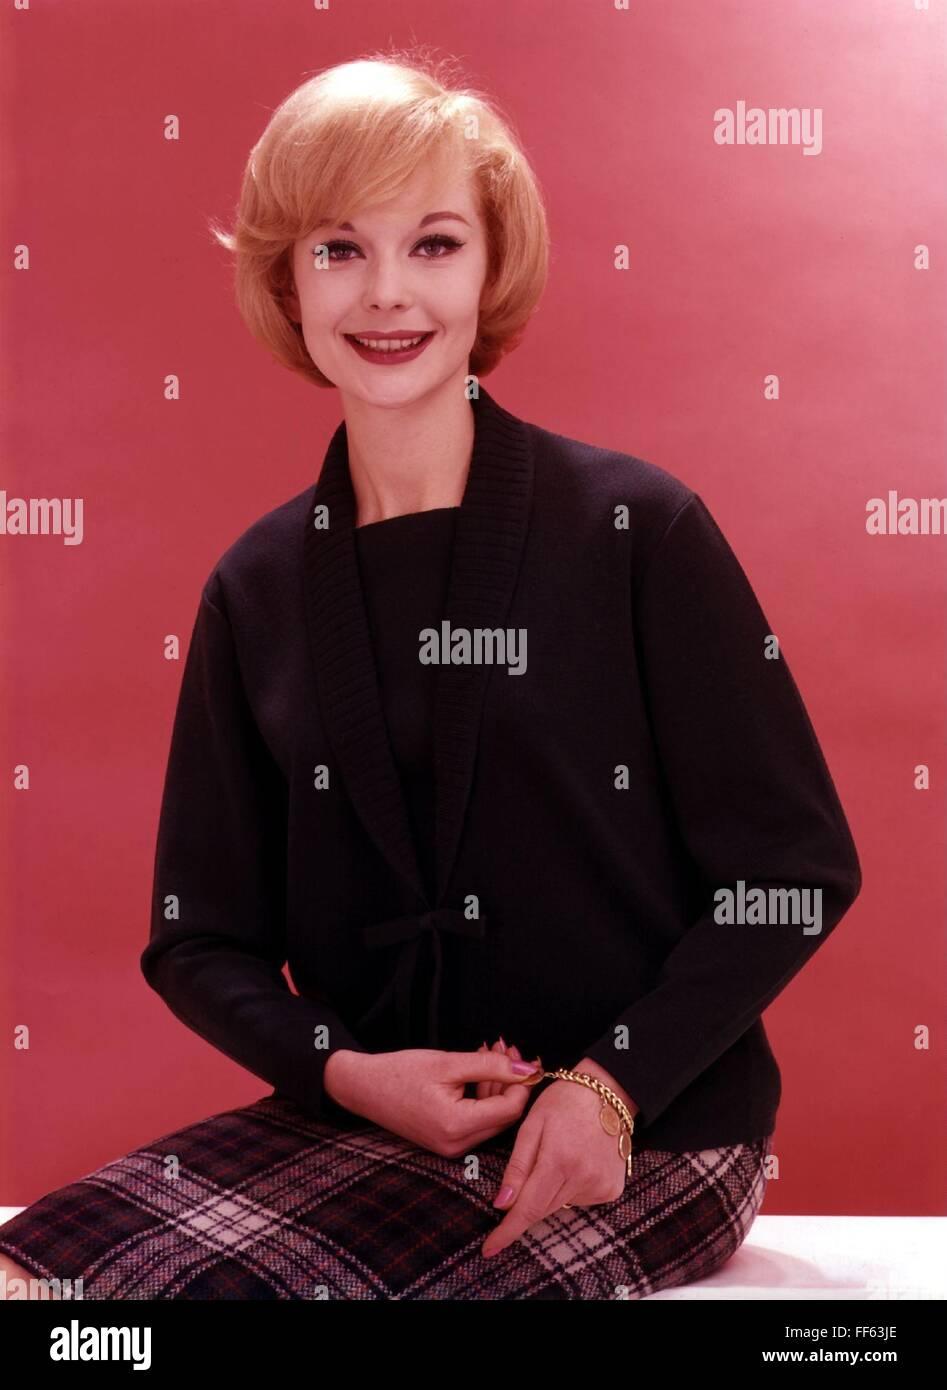 Moda, 1960, señoras' moda, mujer vistiendo negro Twin set, Additional-Rights-Clearences-NA Imagen De Stock